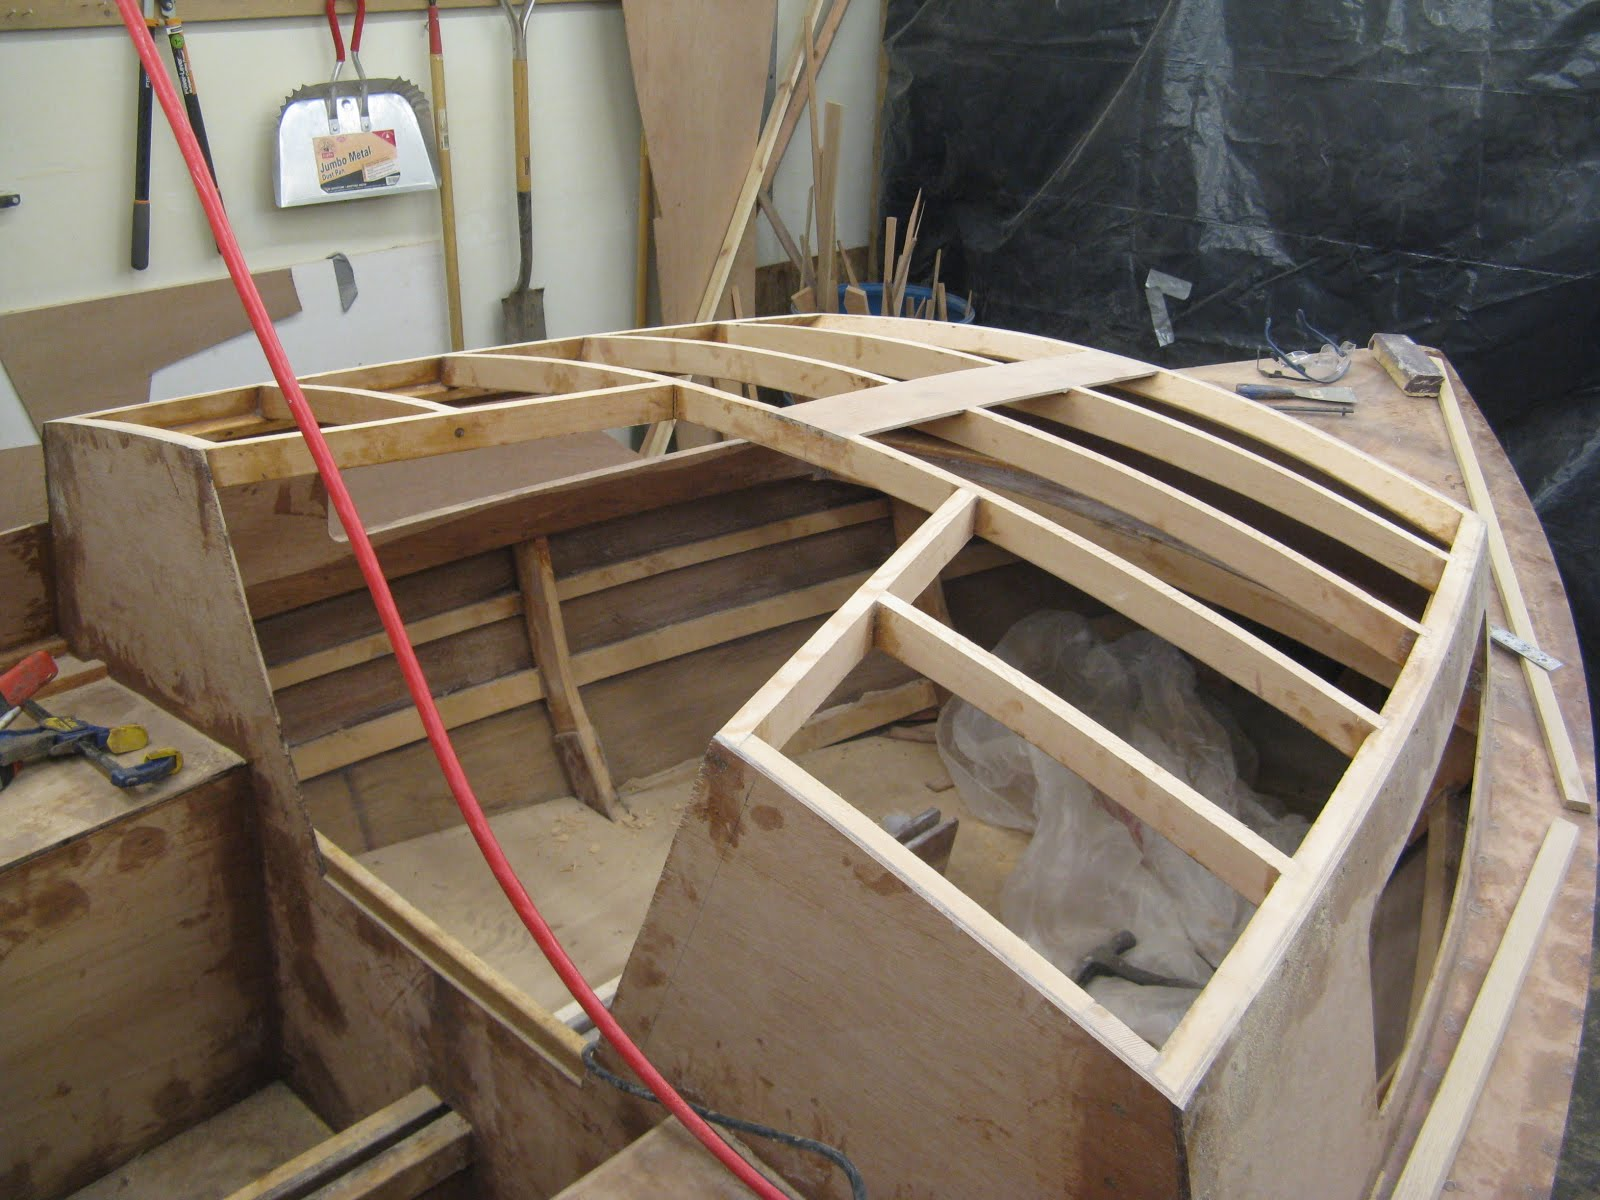 Plywood On Frame Boat Building - Page 4 - Frame Design & Reviews